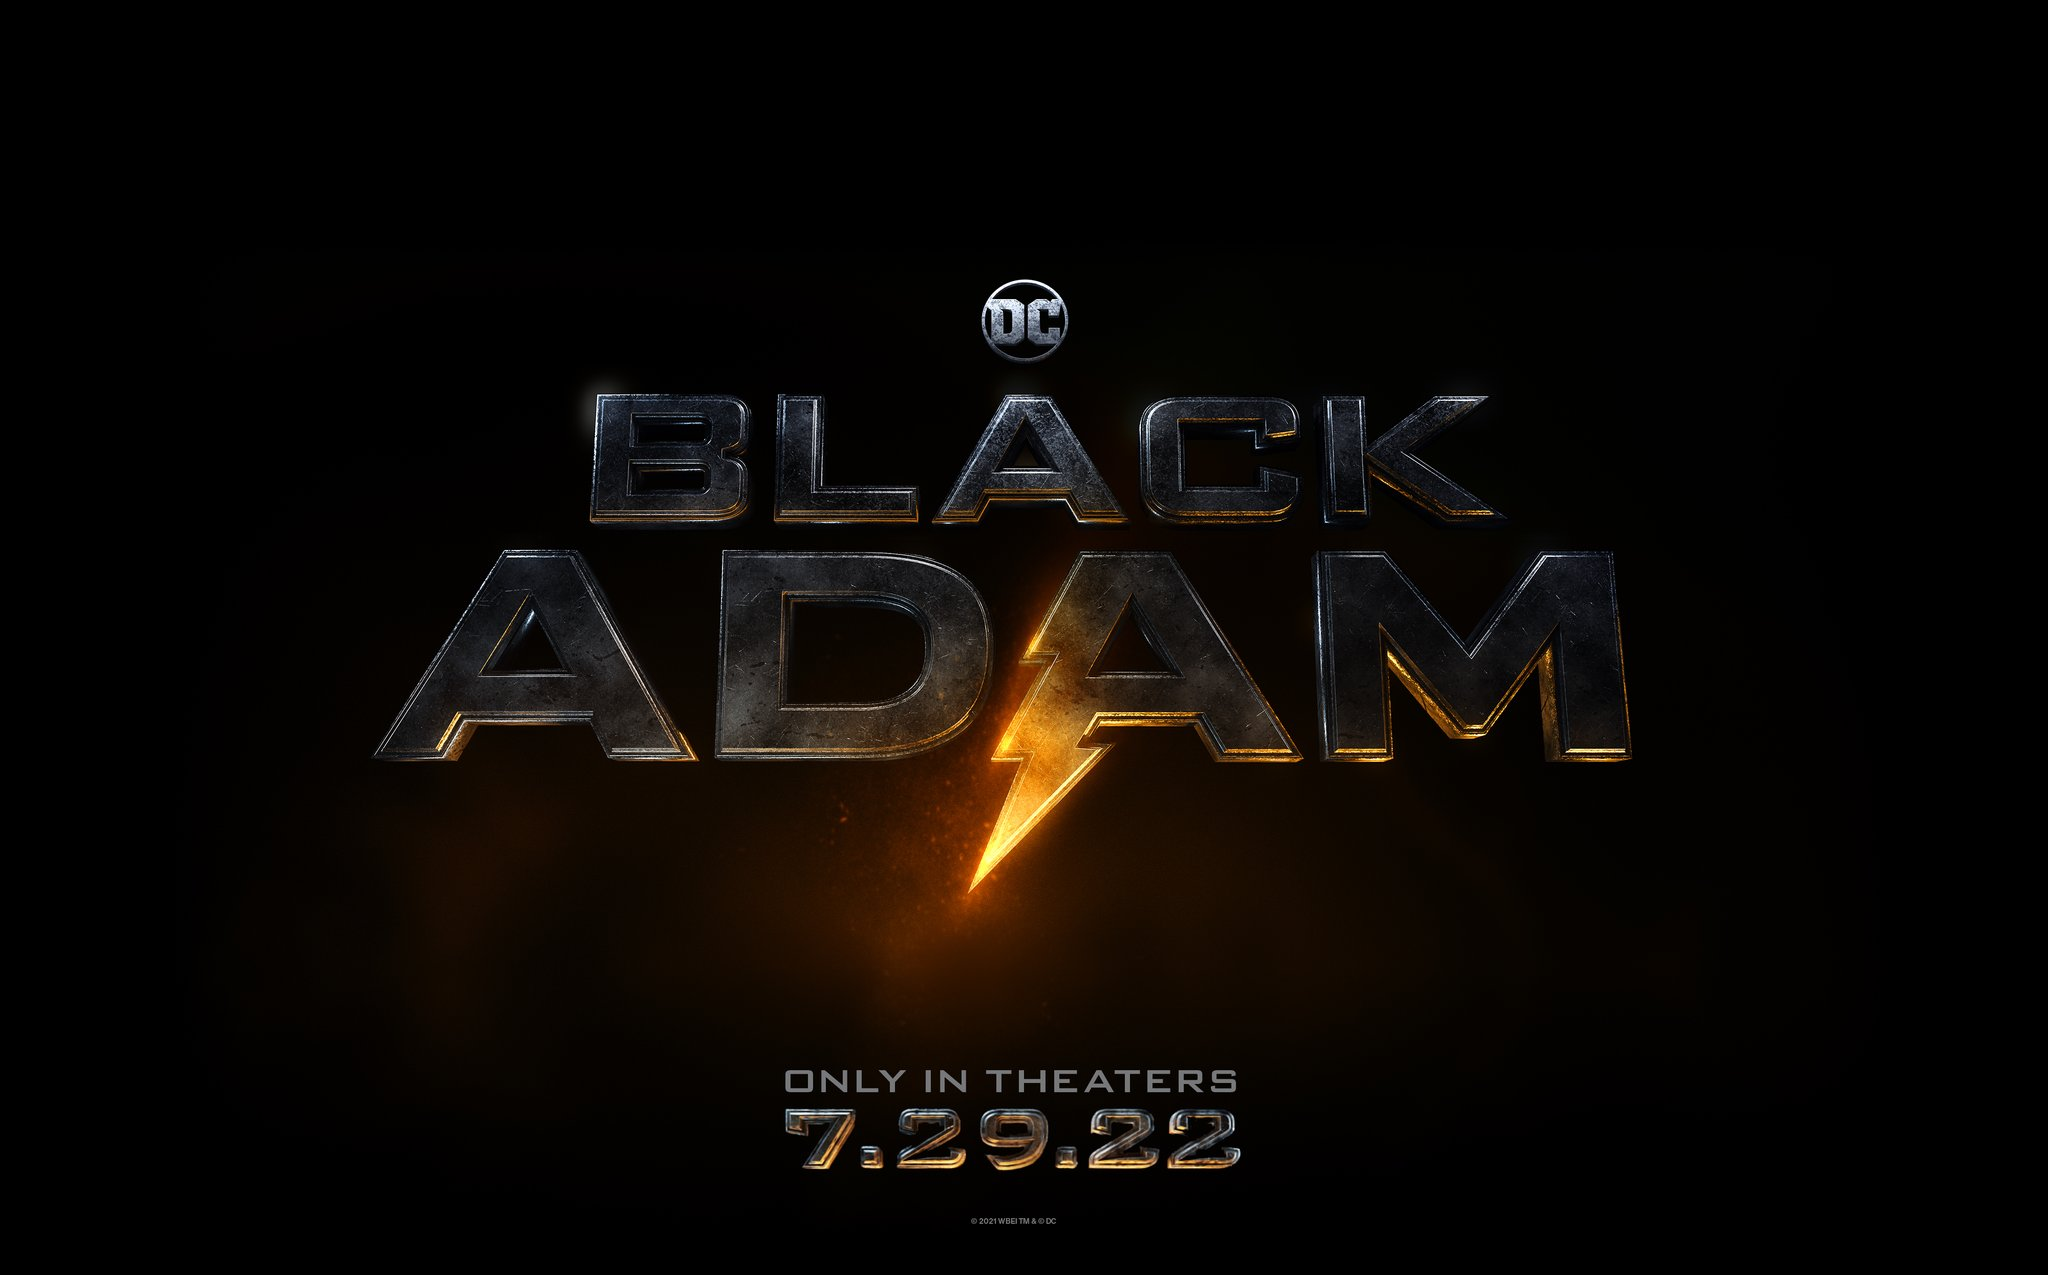 Fecha de estreno de Black Adam